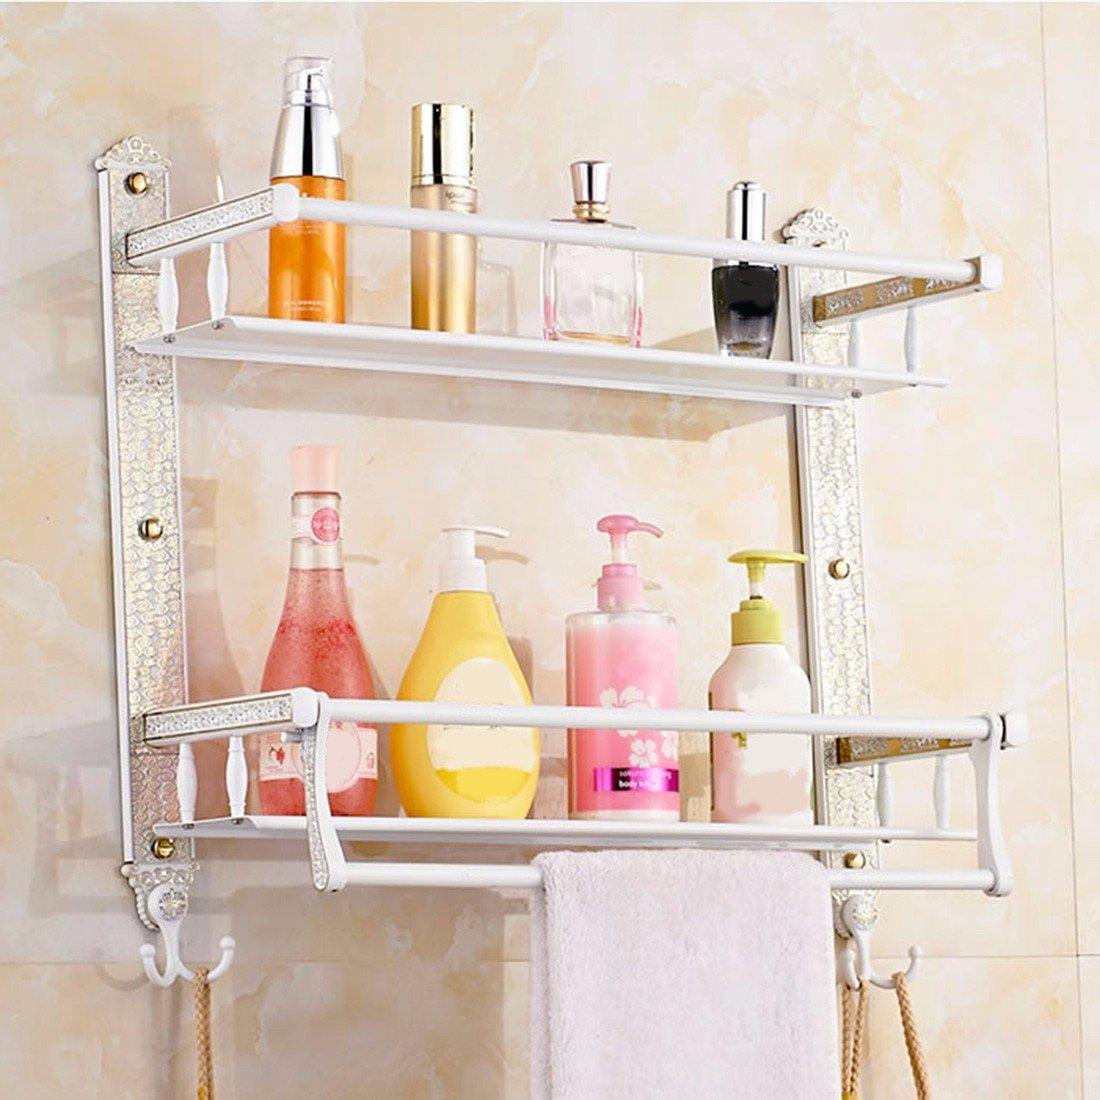 SJQKA Towel rack European Style Carved Bath Towel Rack Stainless Steel Towel Rack Multifunctional Gold Single And Double Layer Bathroom Shelf,I